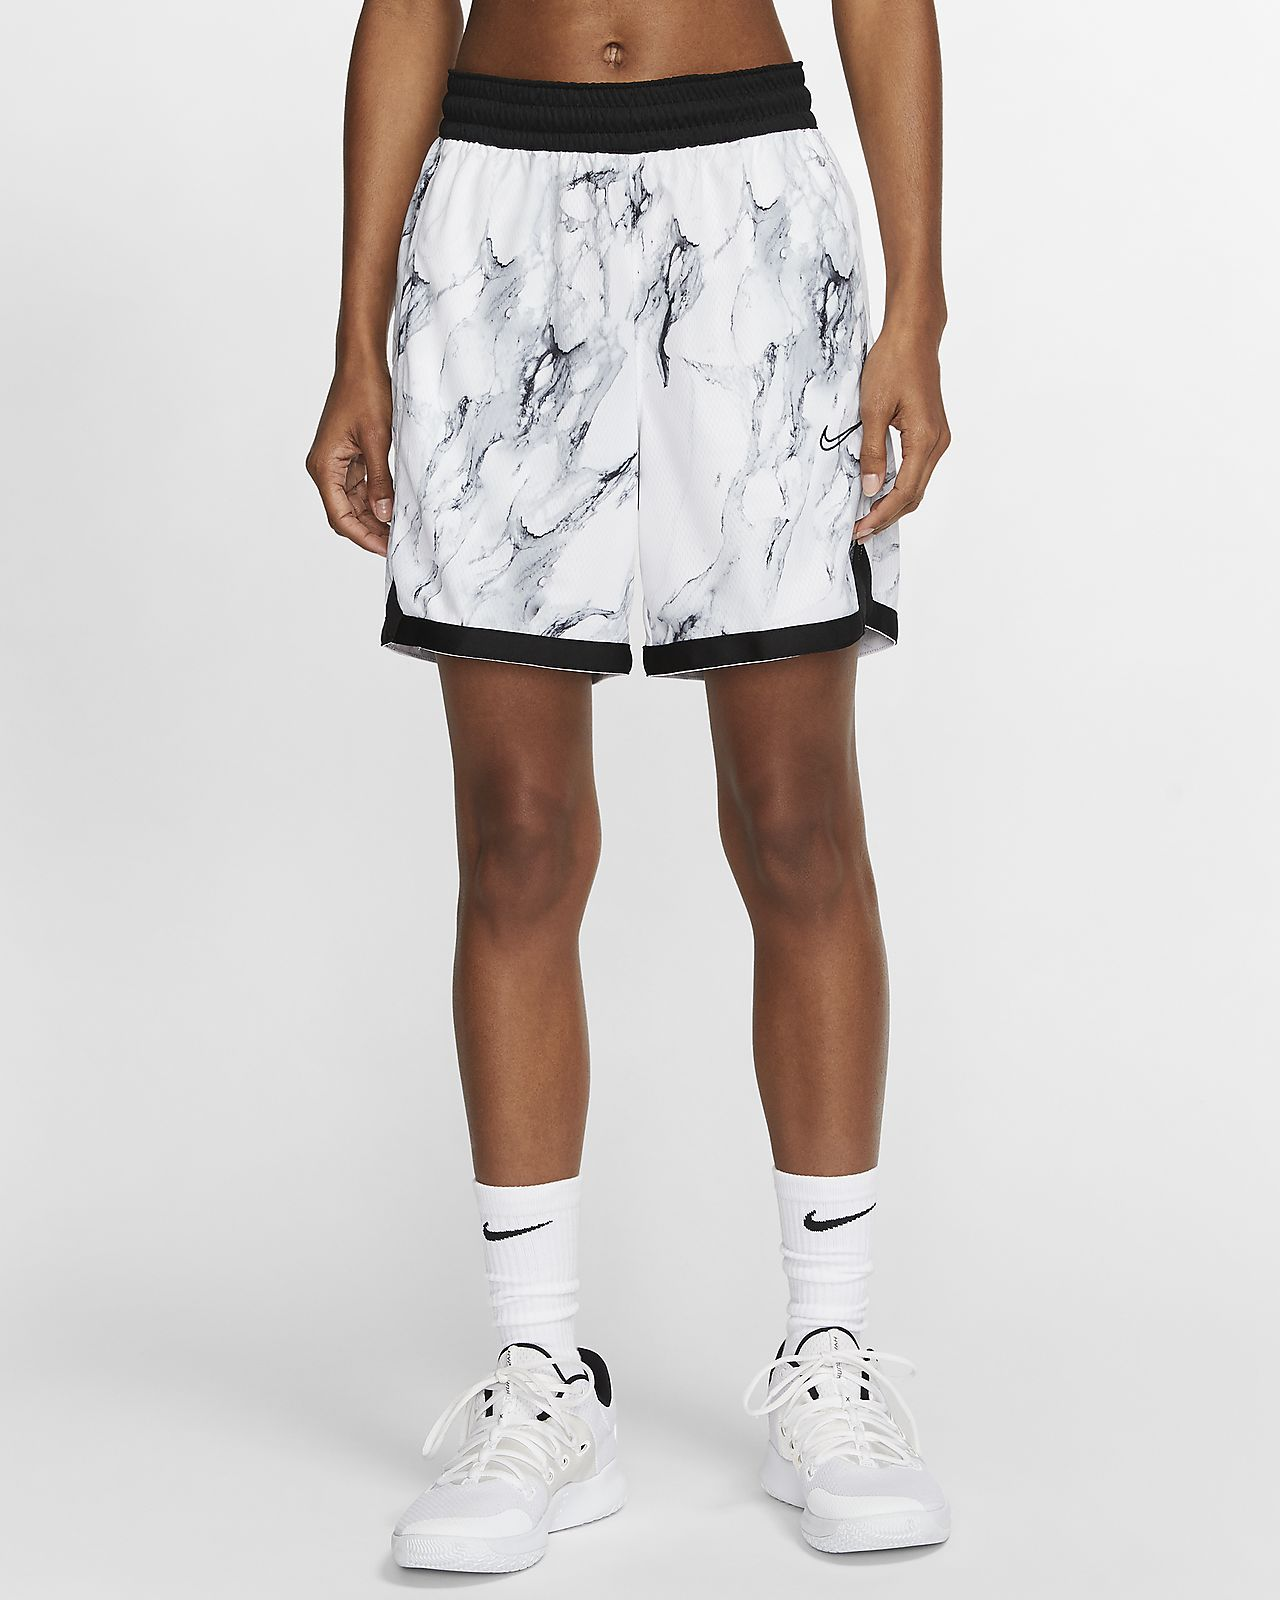 Nike Dri-FIT Pantalón corto de baloncesto - Mujer